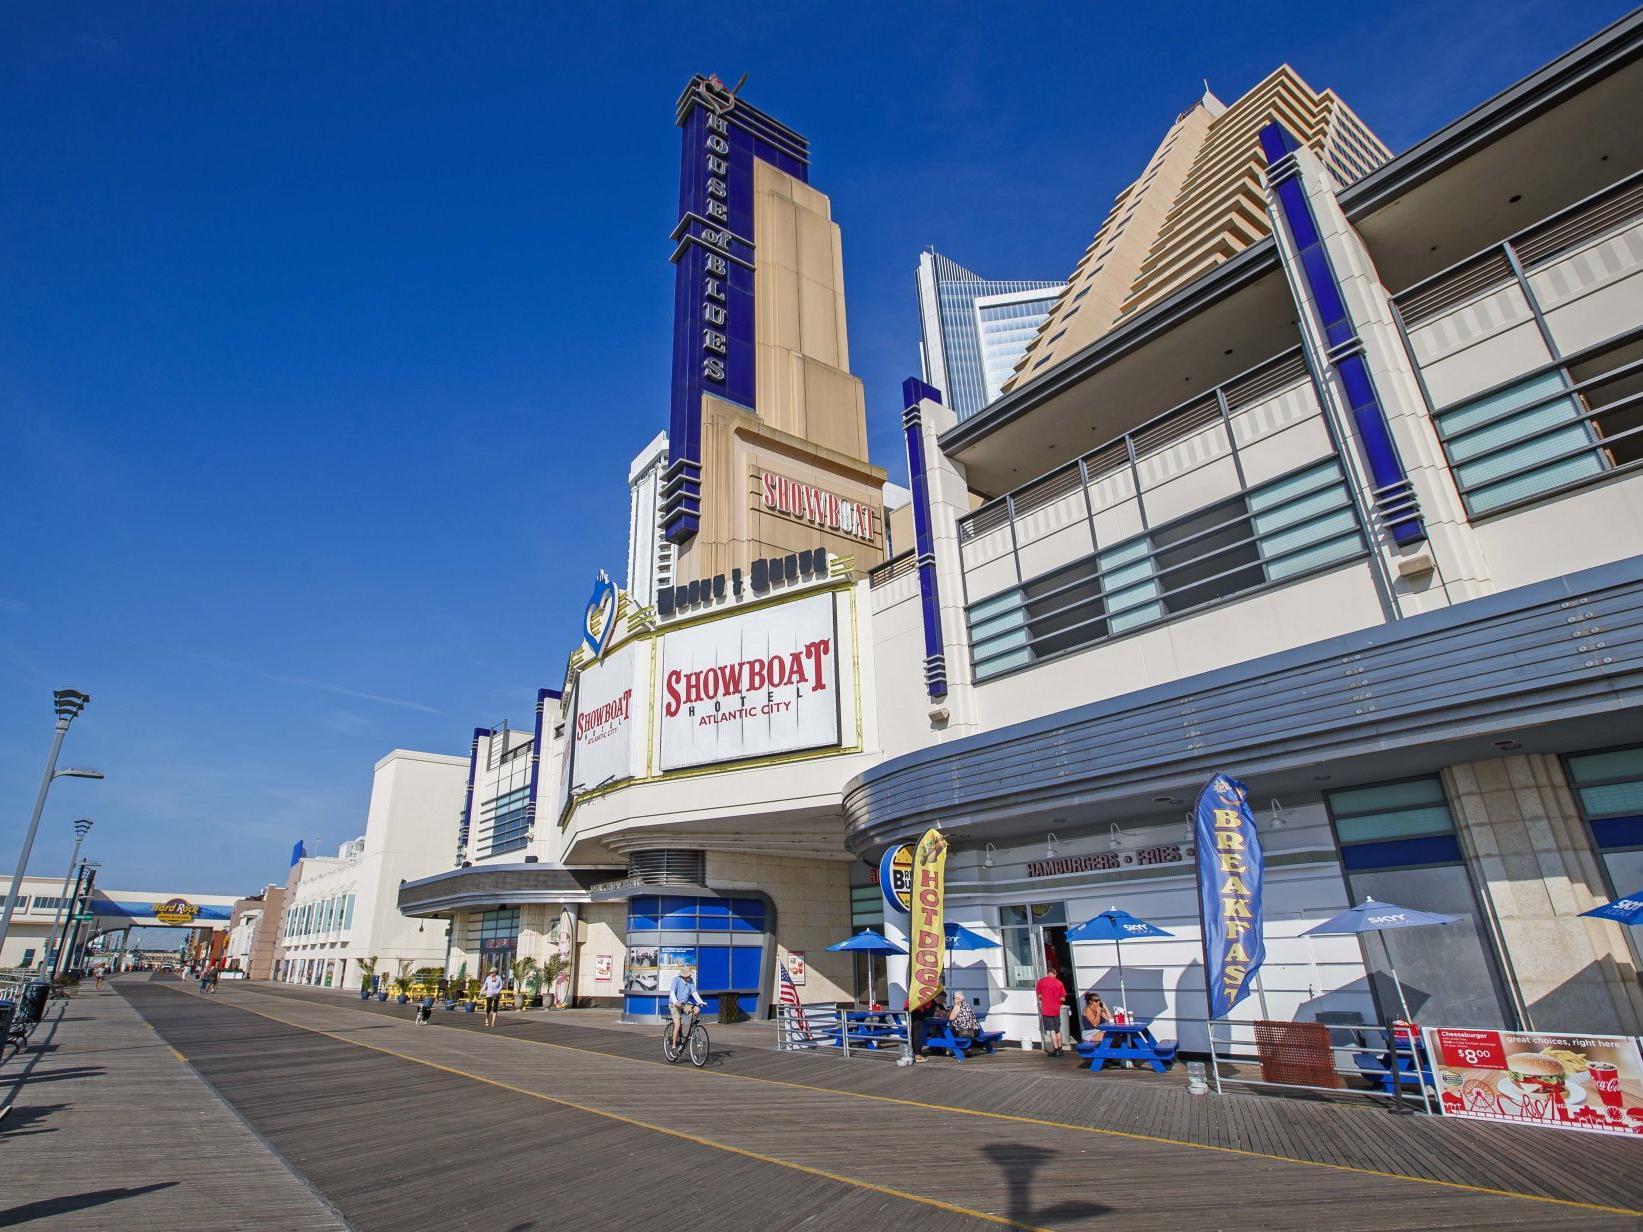 Showboat casino hotel ac igt turbine blades